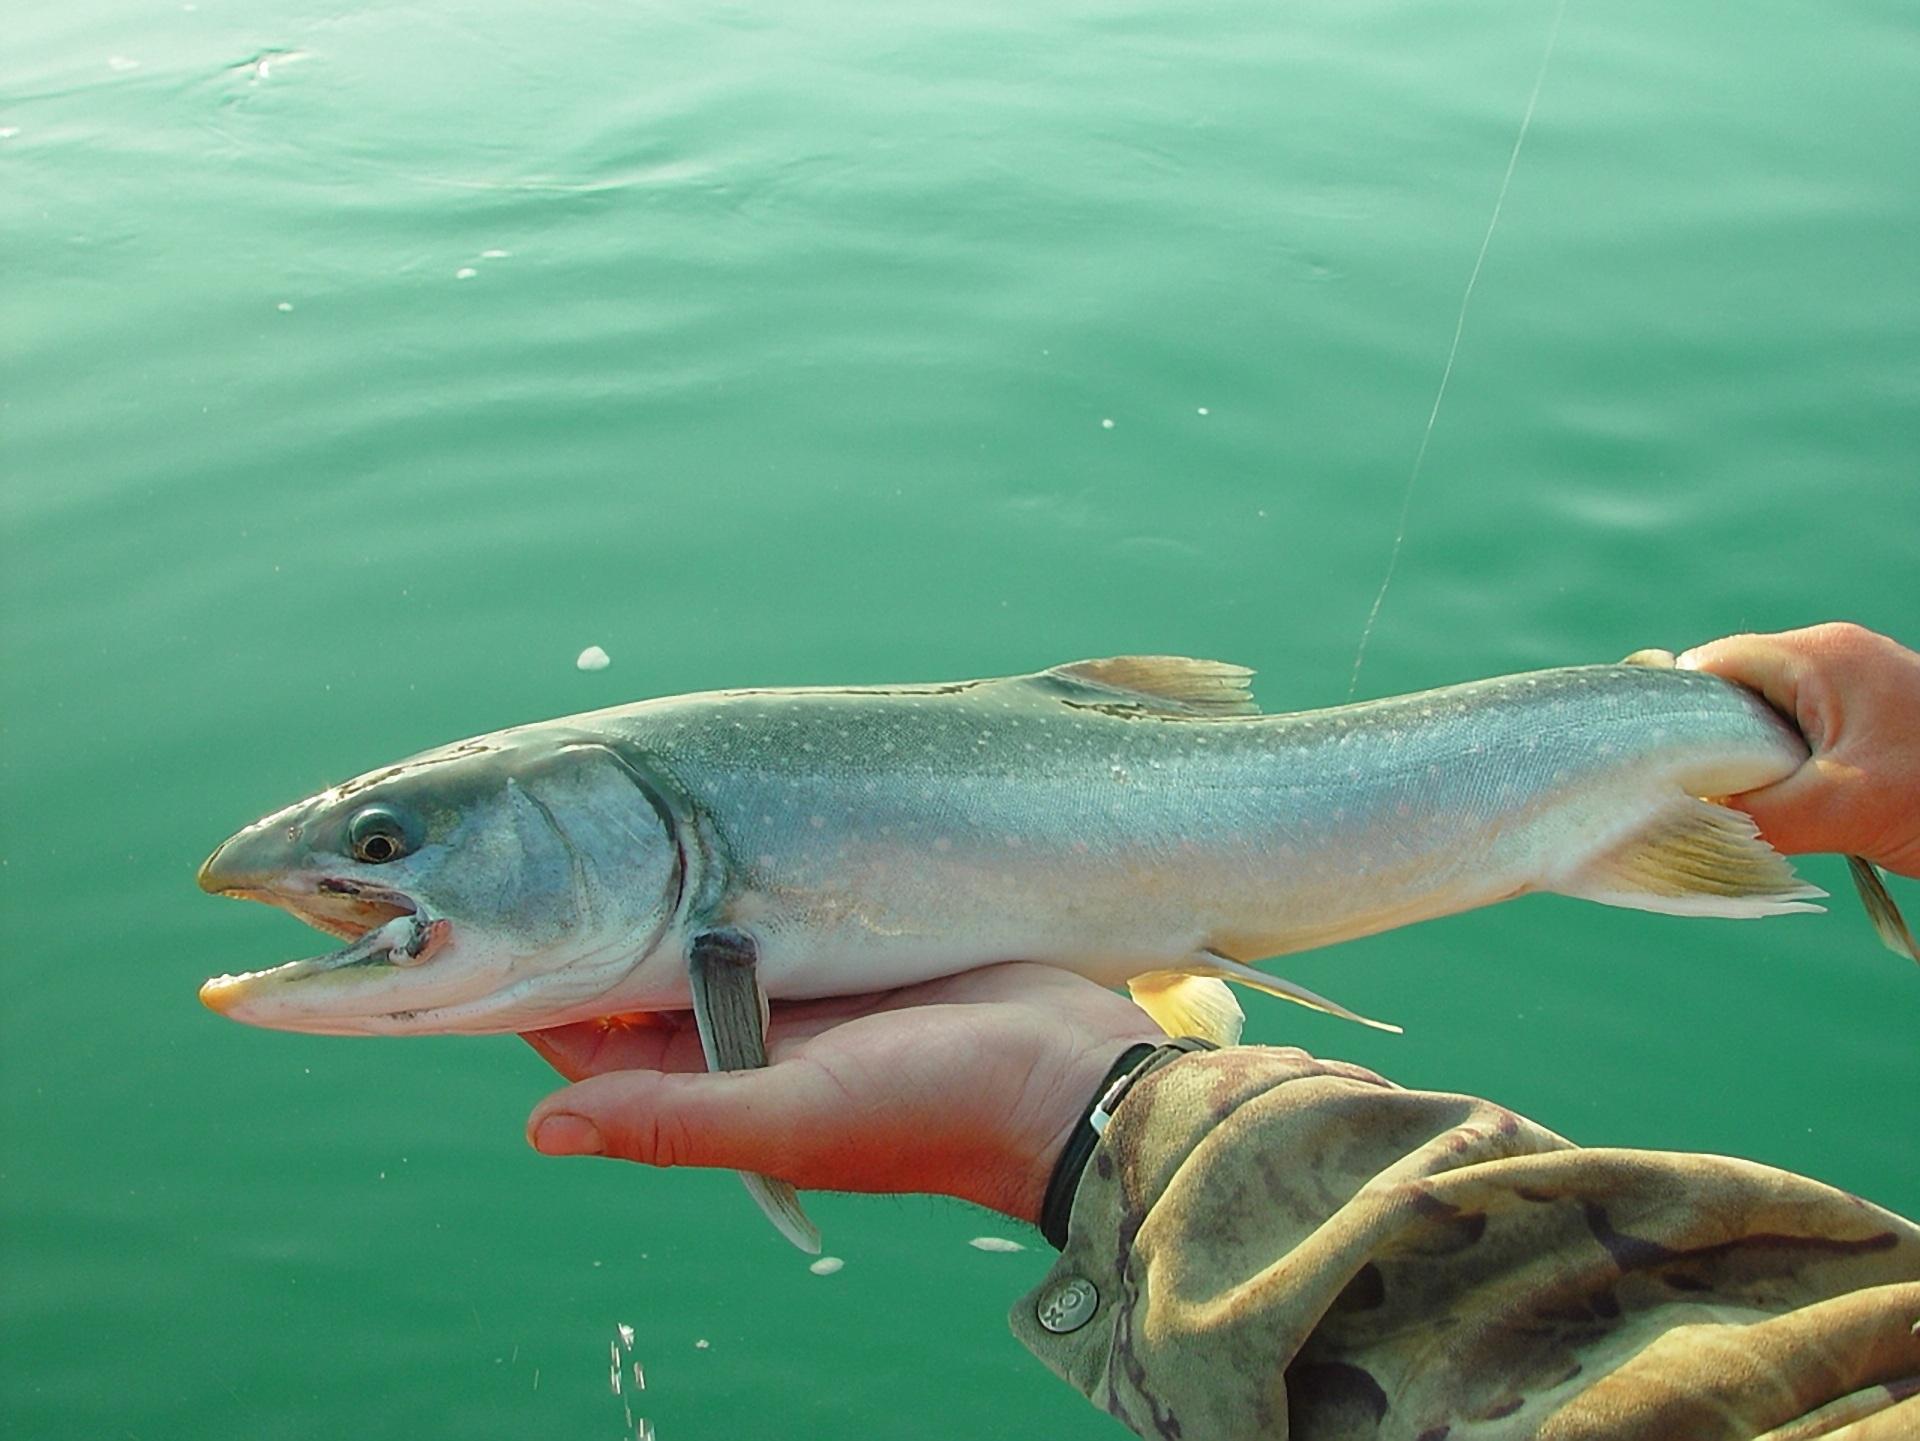 Free Images : water, nature, wildlife, wild, usa, seafood, fresh ...